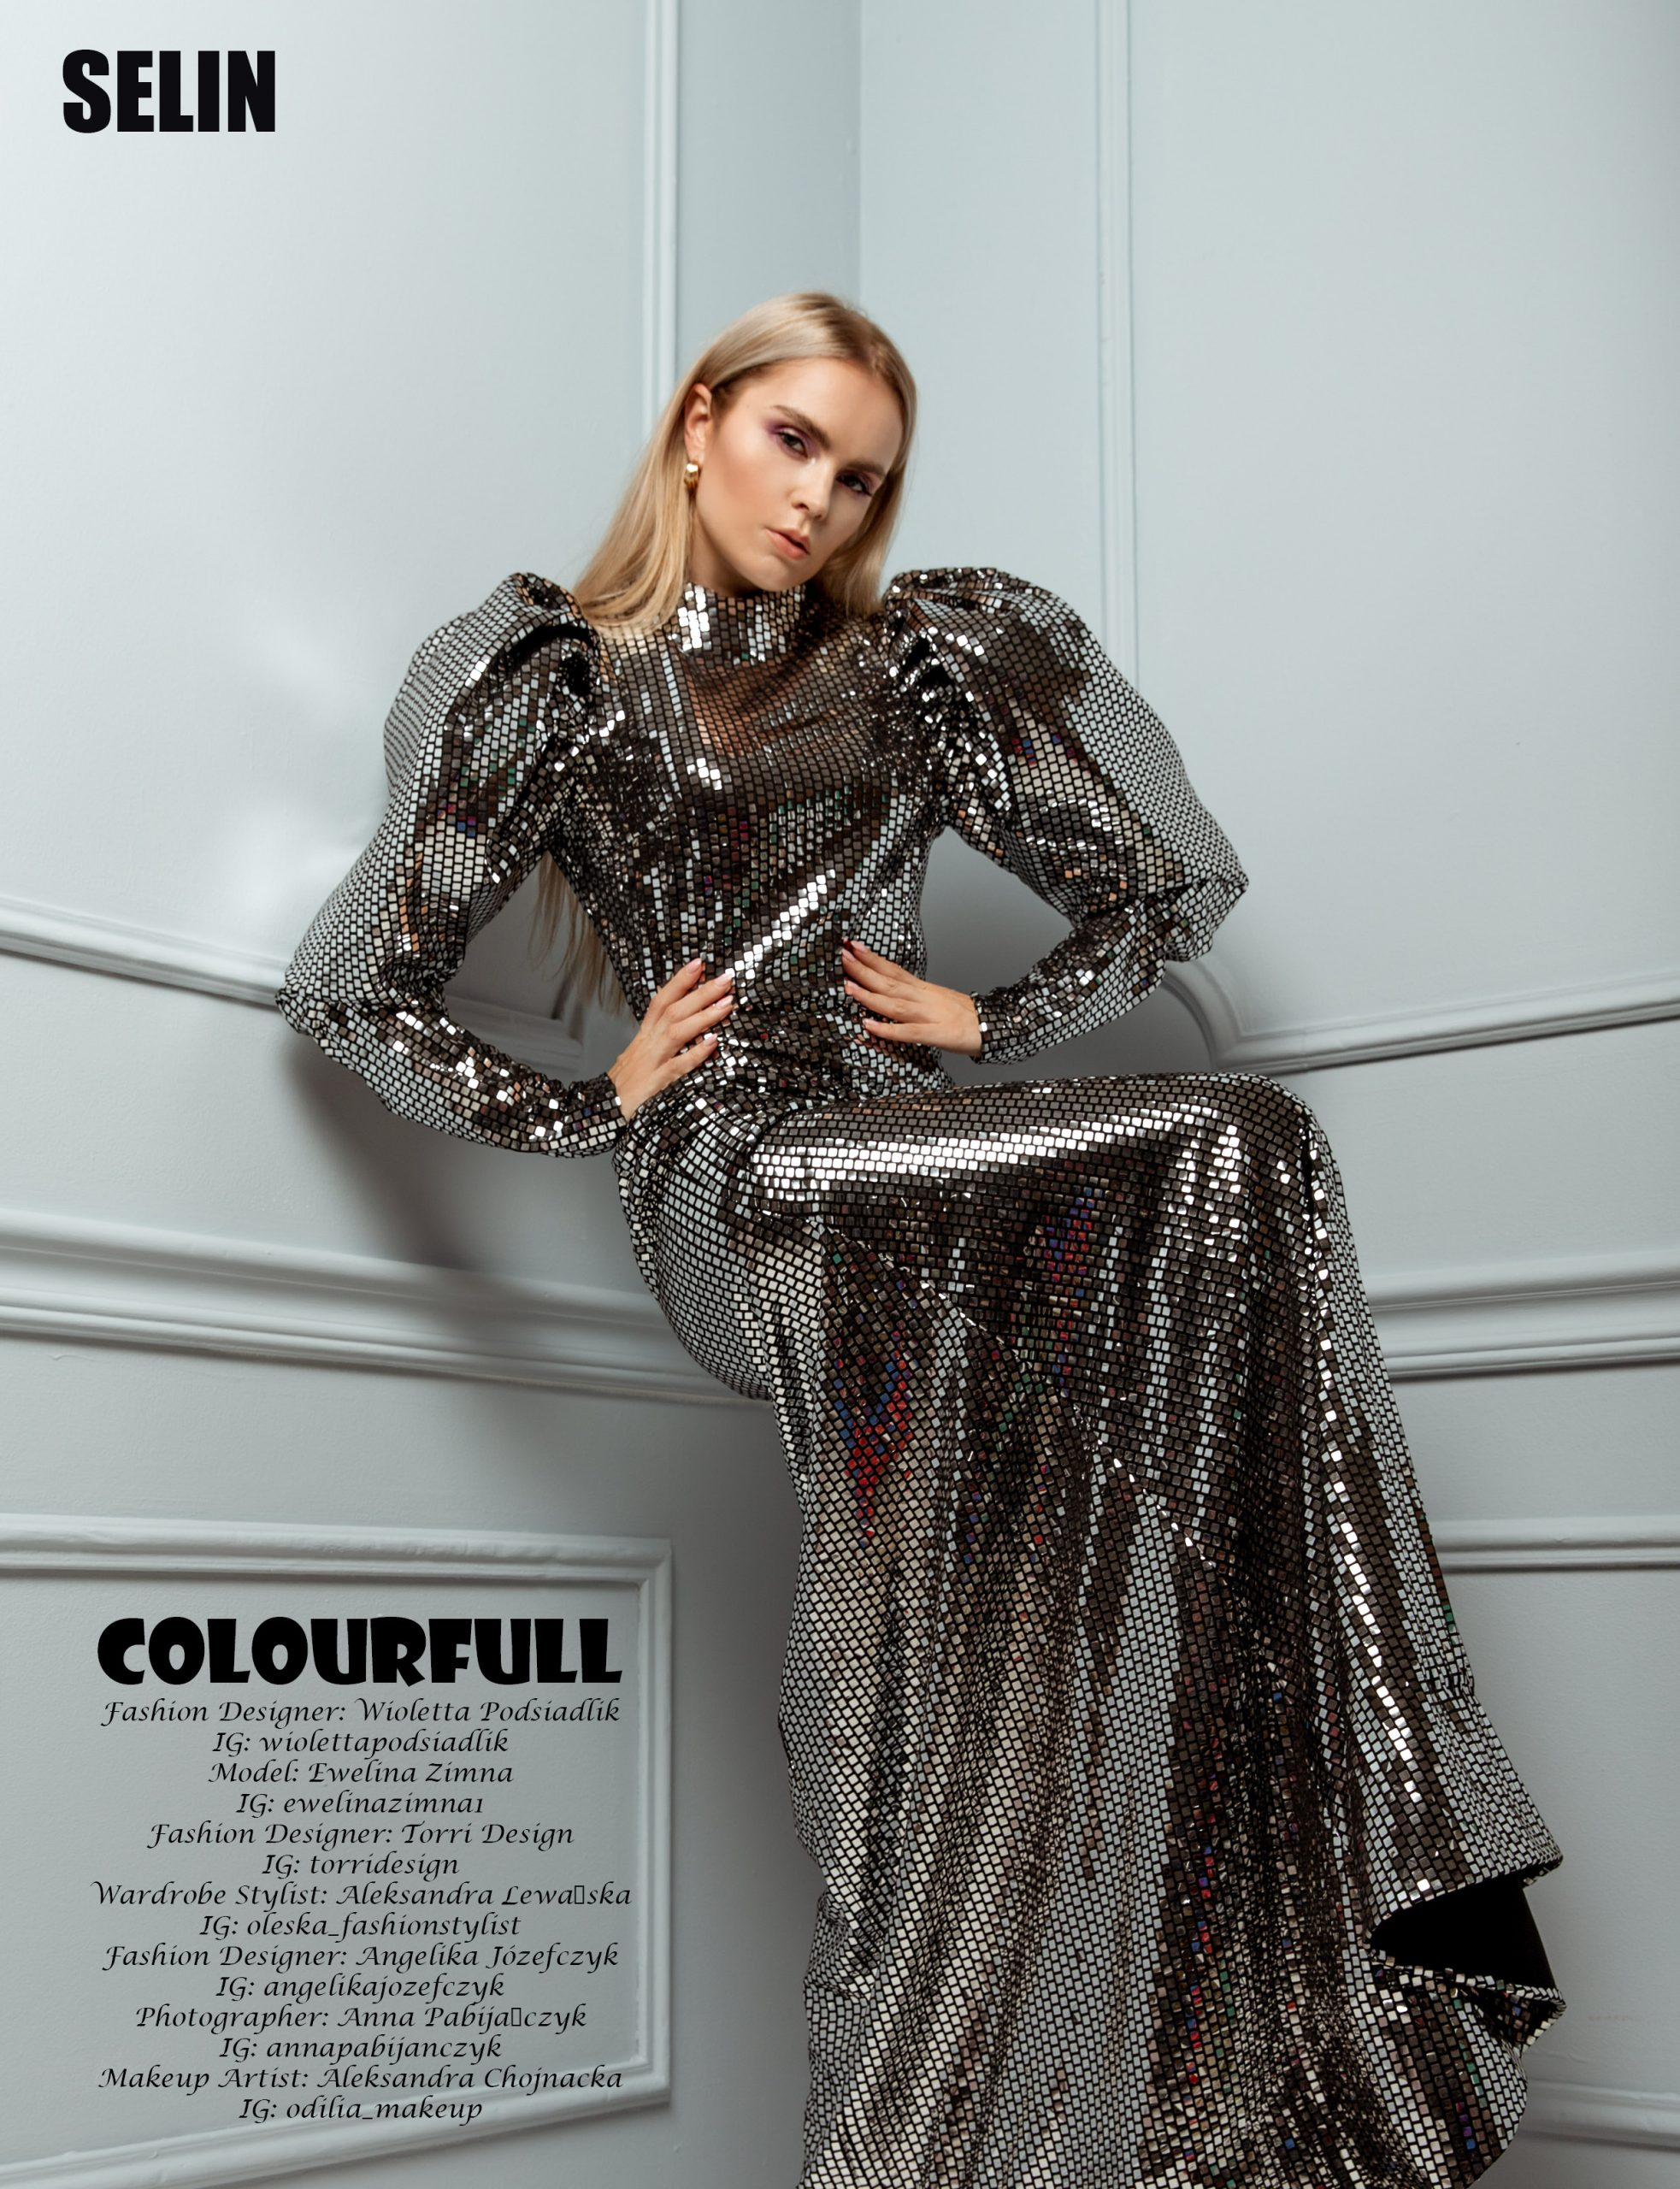 Mirror Dress in Selin magazine